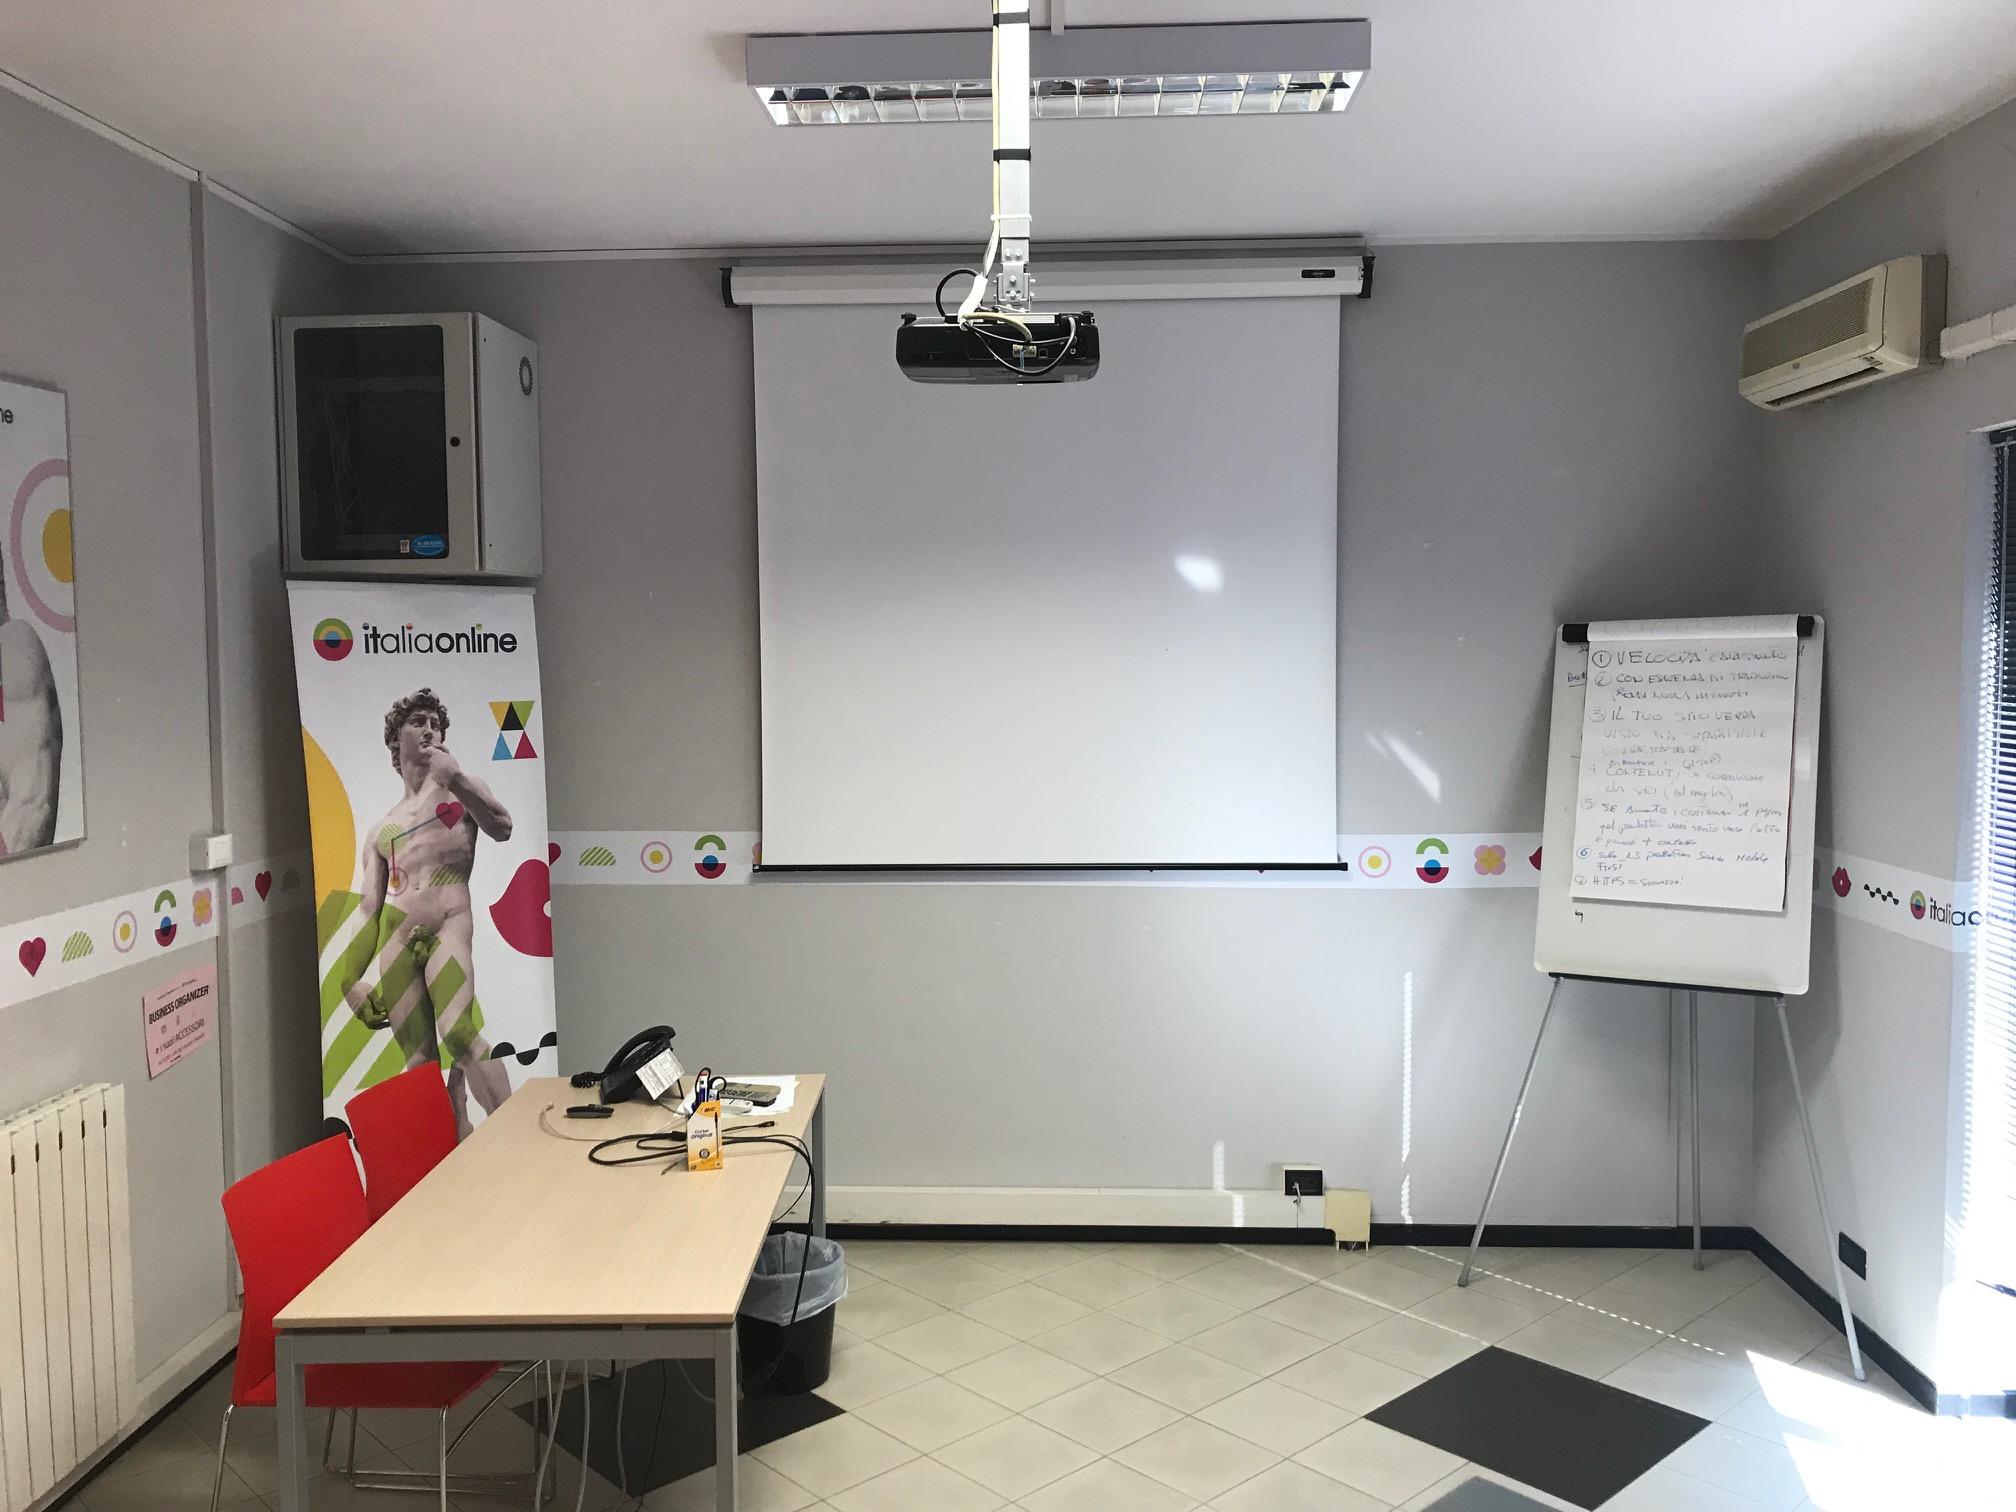 Italiaonline Novara sala riunione 3